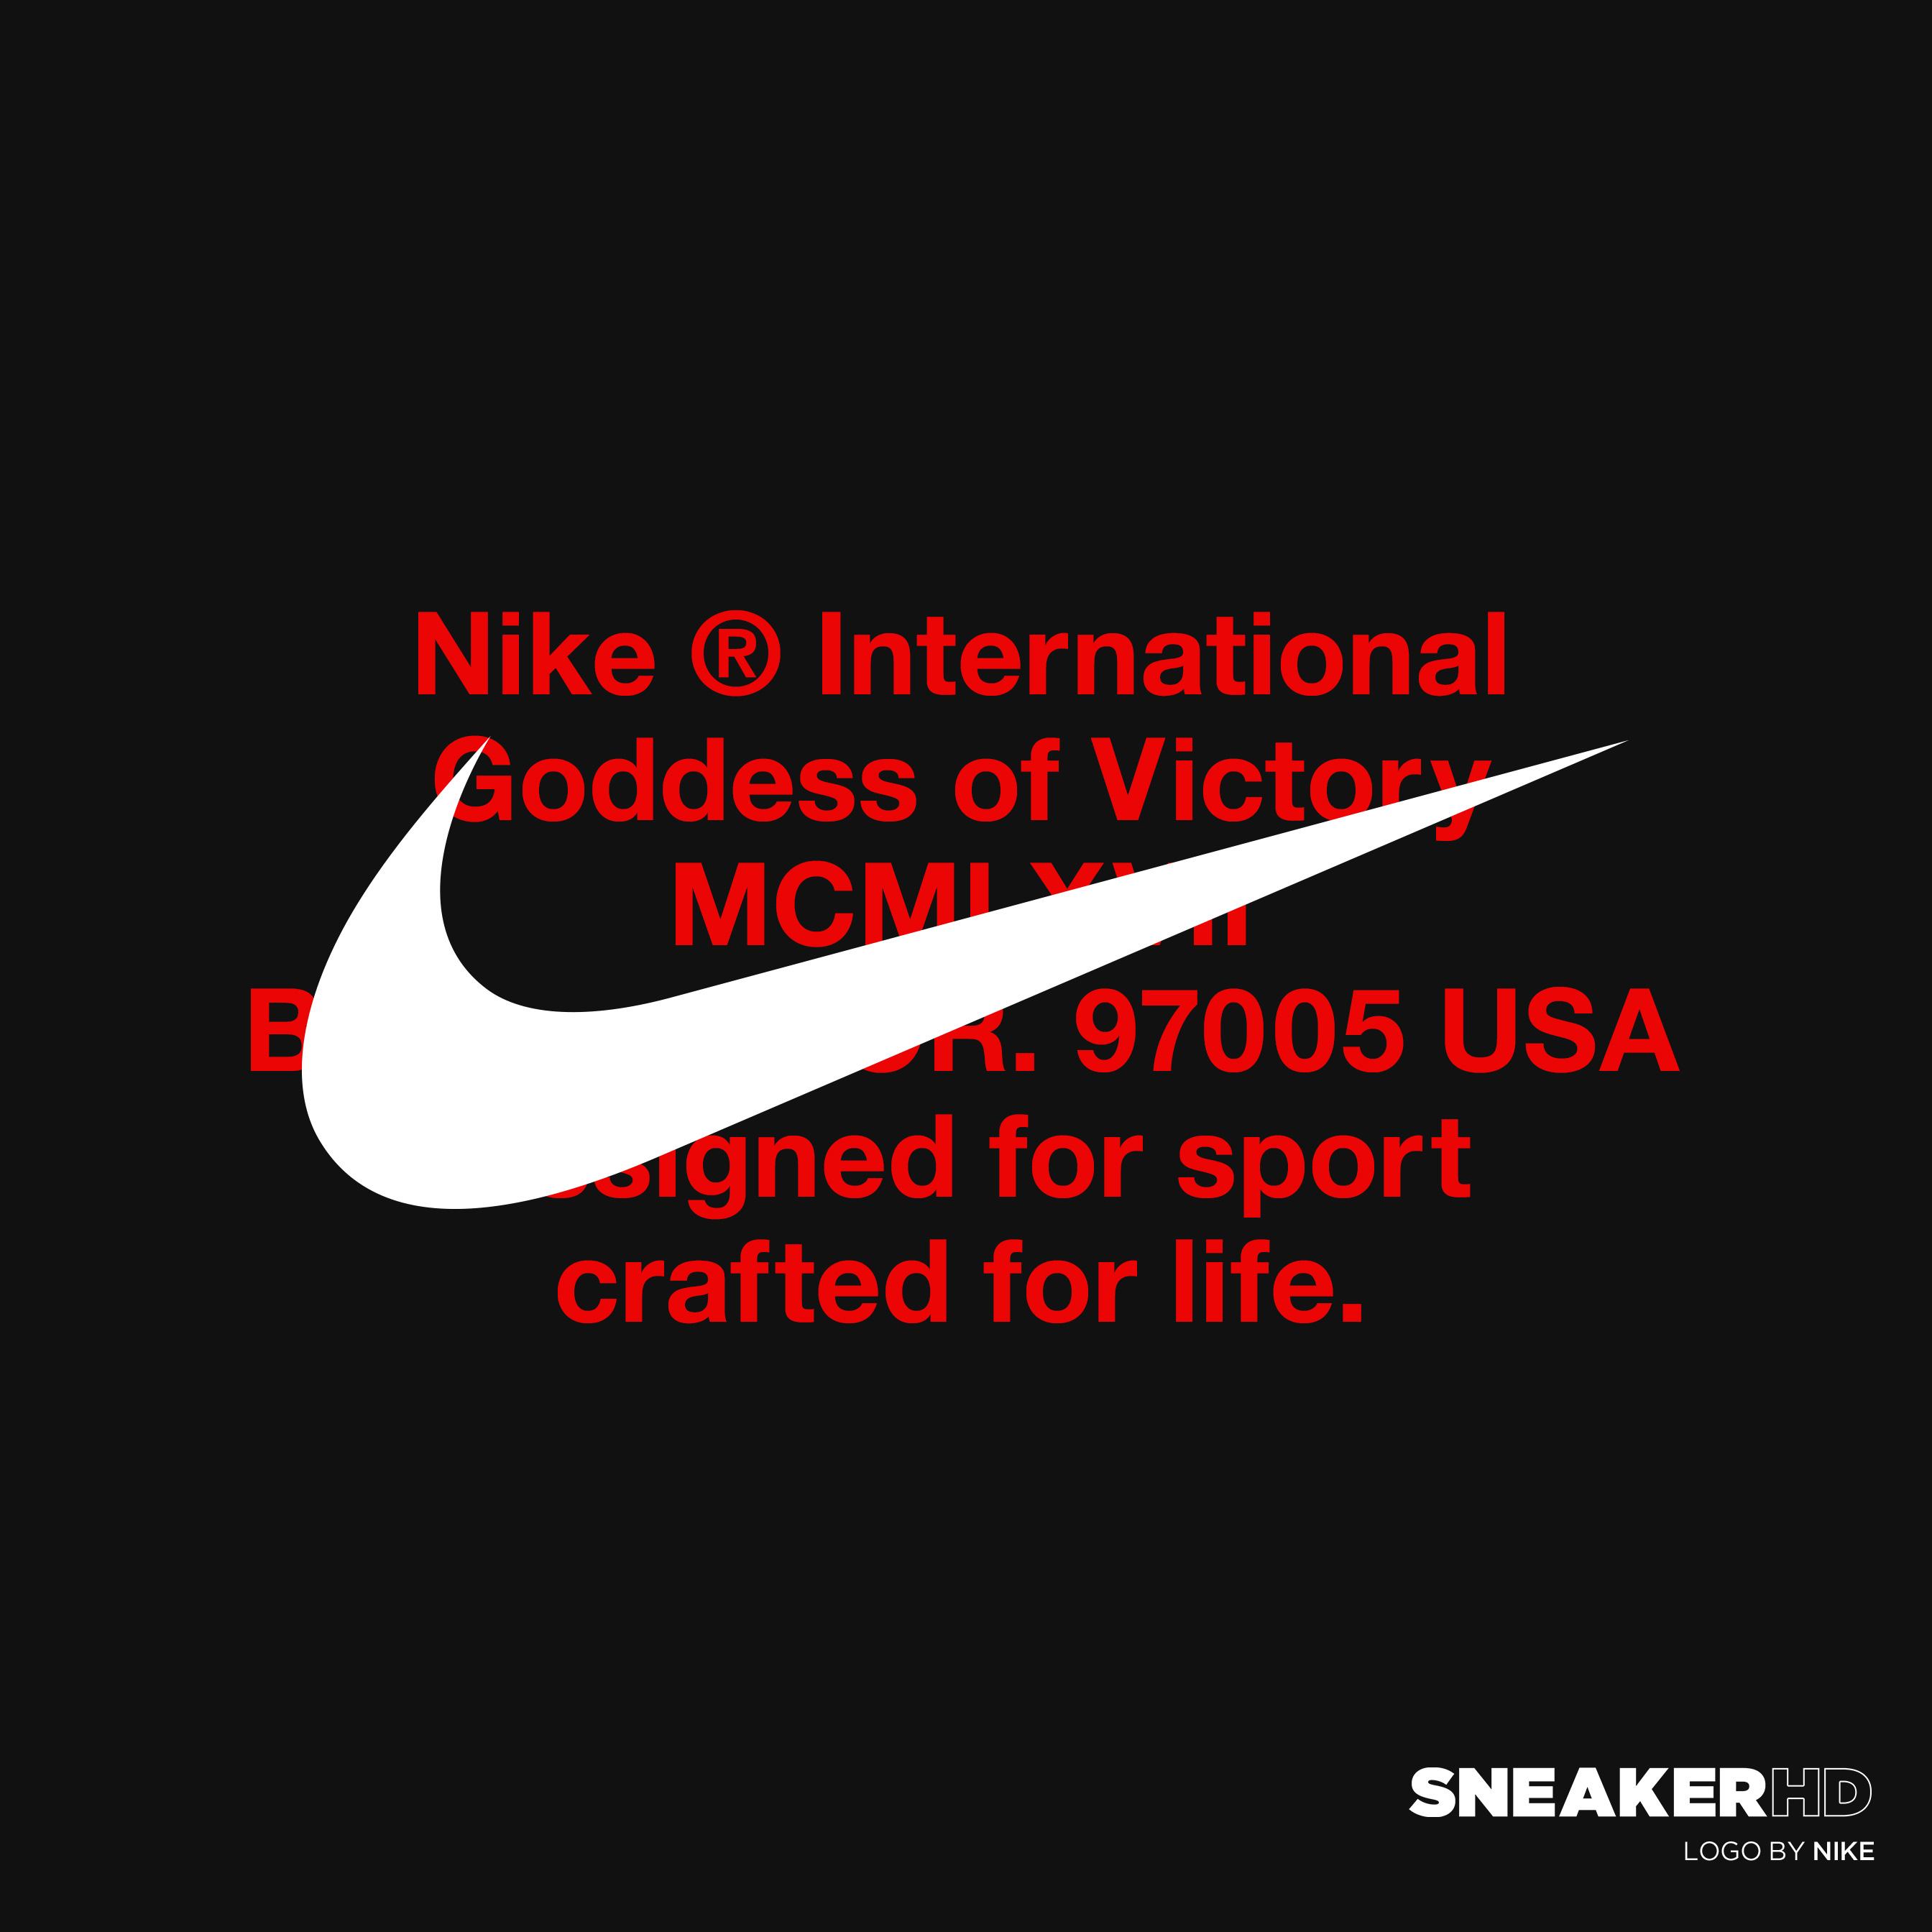 Sneakerhdwallpapers Com Your Favorite Sneakers In 4k Retina Mobile And Hd Wallpaper Resolutions More Nike Wallpapers Archives Sneakerhdwallpapers Com Your Favorite Sneakers In 4k Retina Mobile And Hd Wallpaper Resolutions